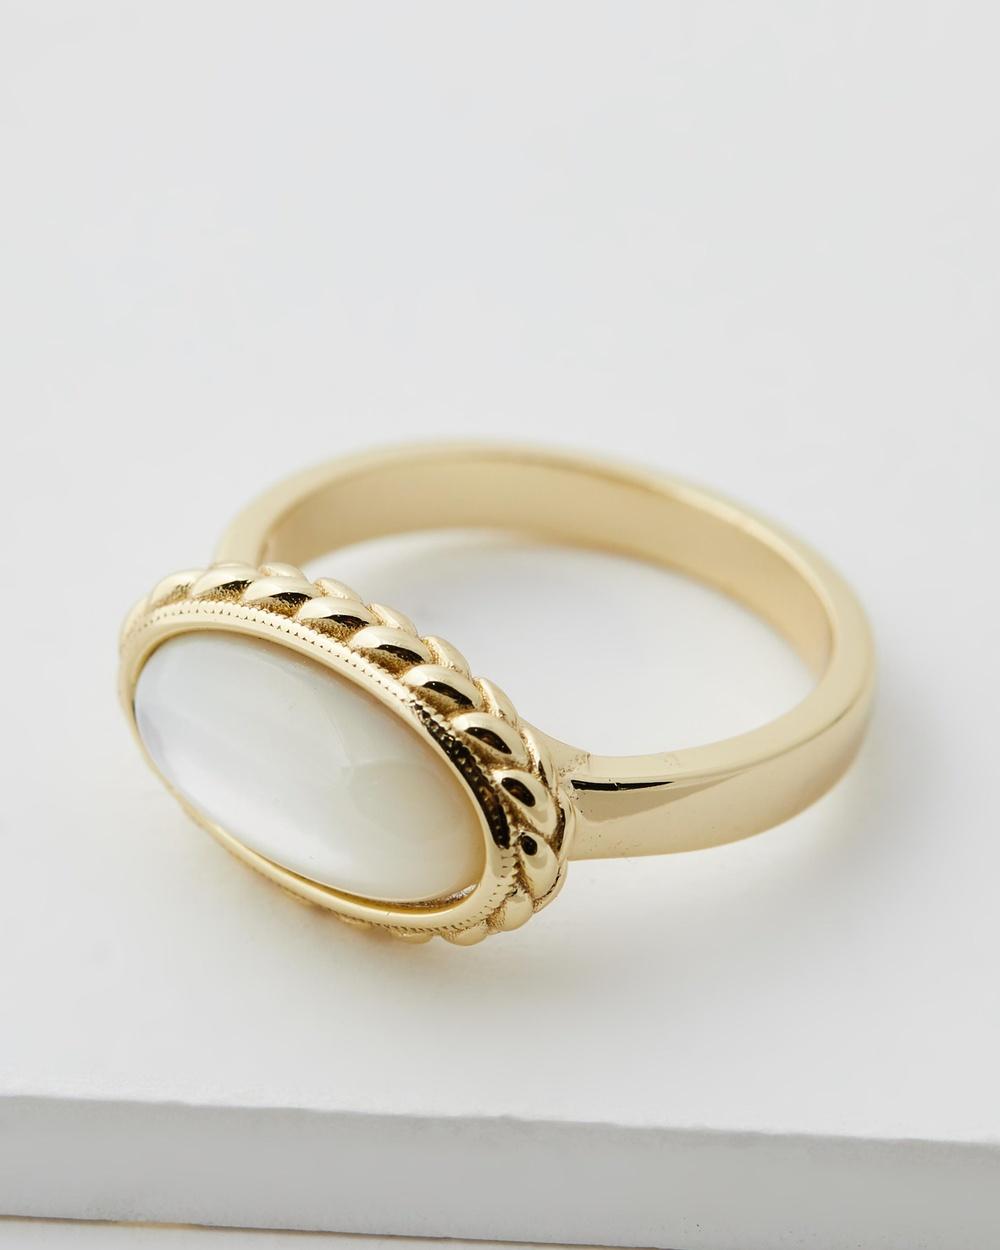 Serge DeNimes Pearl Rope Ring Jewellery Gold